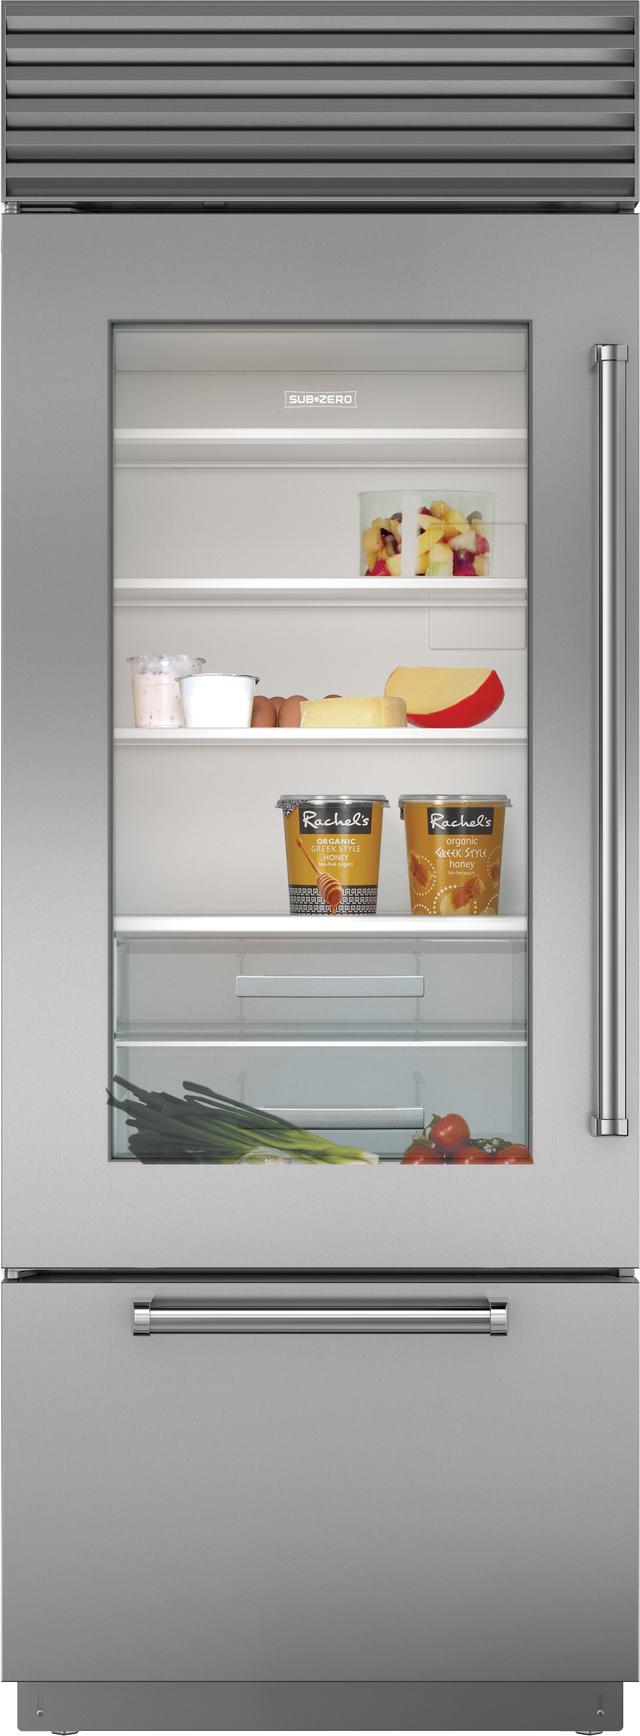 Sub-Zero® 17.3 Cu. Ft. Built In Bottom Freezer Refrigerator-Stainless Steel-BI-30UA/S/PH-RH